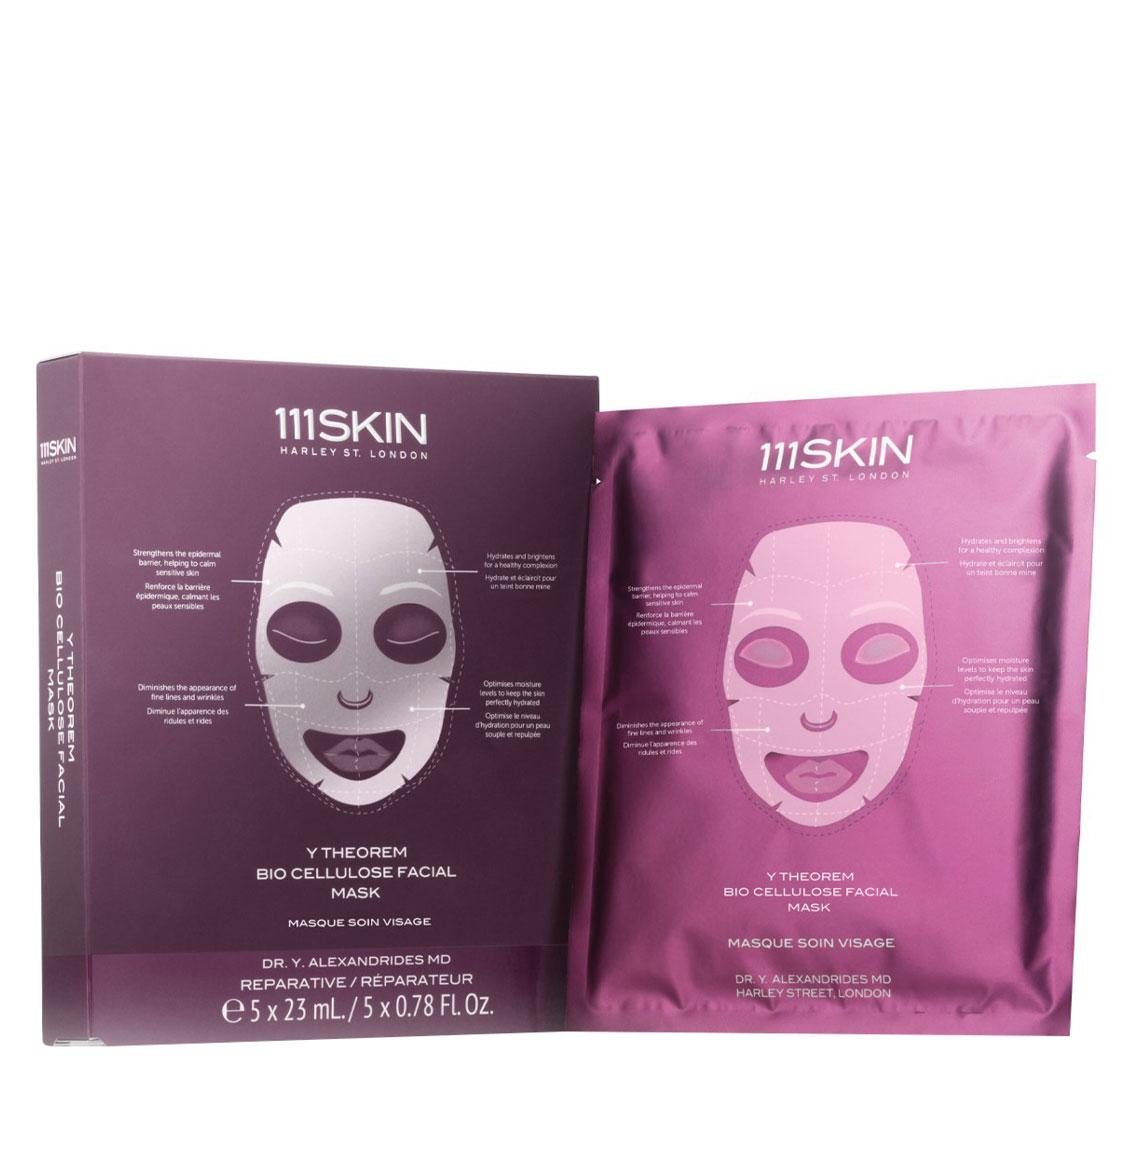 111Skin Y Theorem Bio Cellulose Facial Mask 23ml